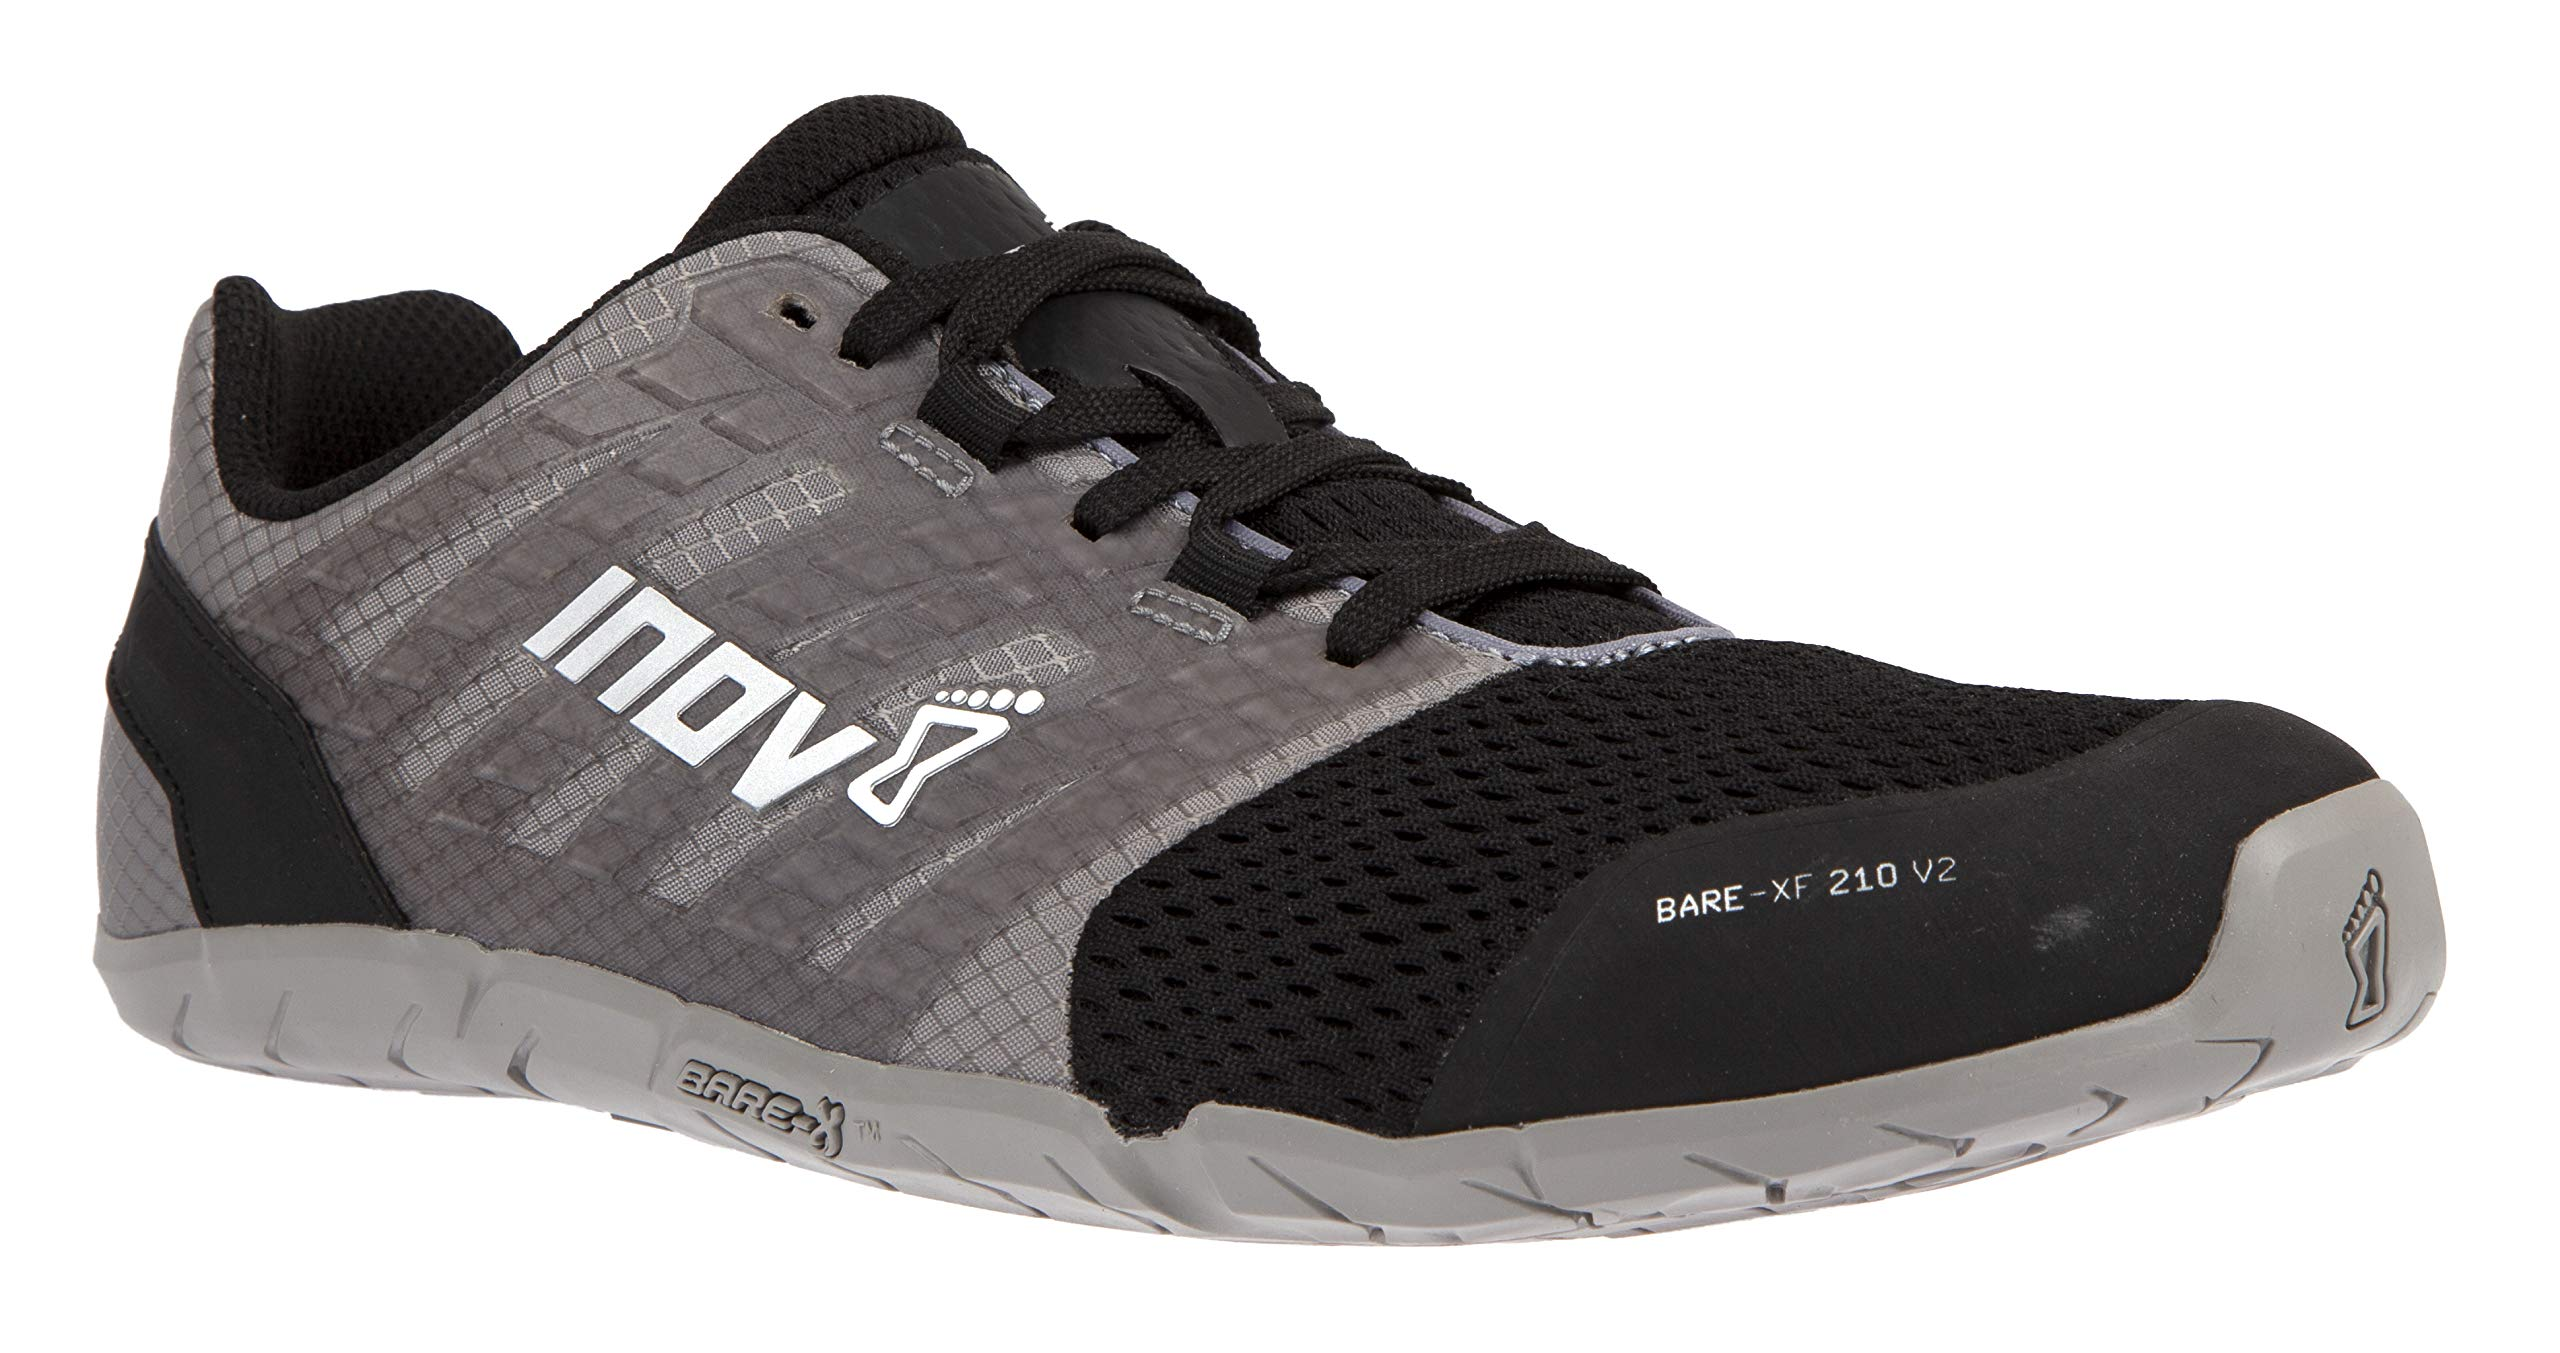 Inov-8 Womens Bare-XF 210 V2 - Barefoot Minimalist Cross Training Shoes - Zero Drop - Wide Toe Box - Versatile Shoe for Powerlifting & Gym - Calisthenics & Martial Arts - Grey/Black 6 W US by Inov-8